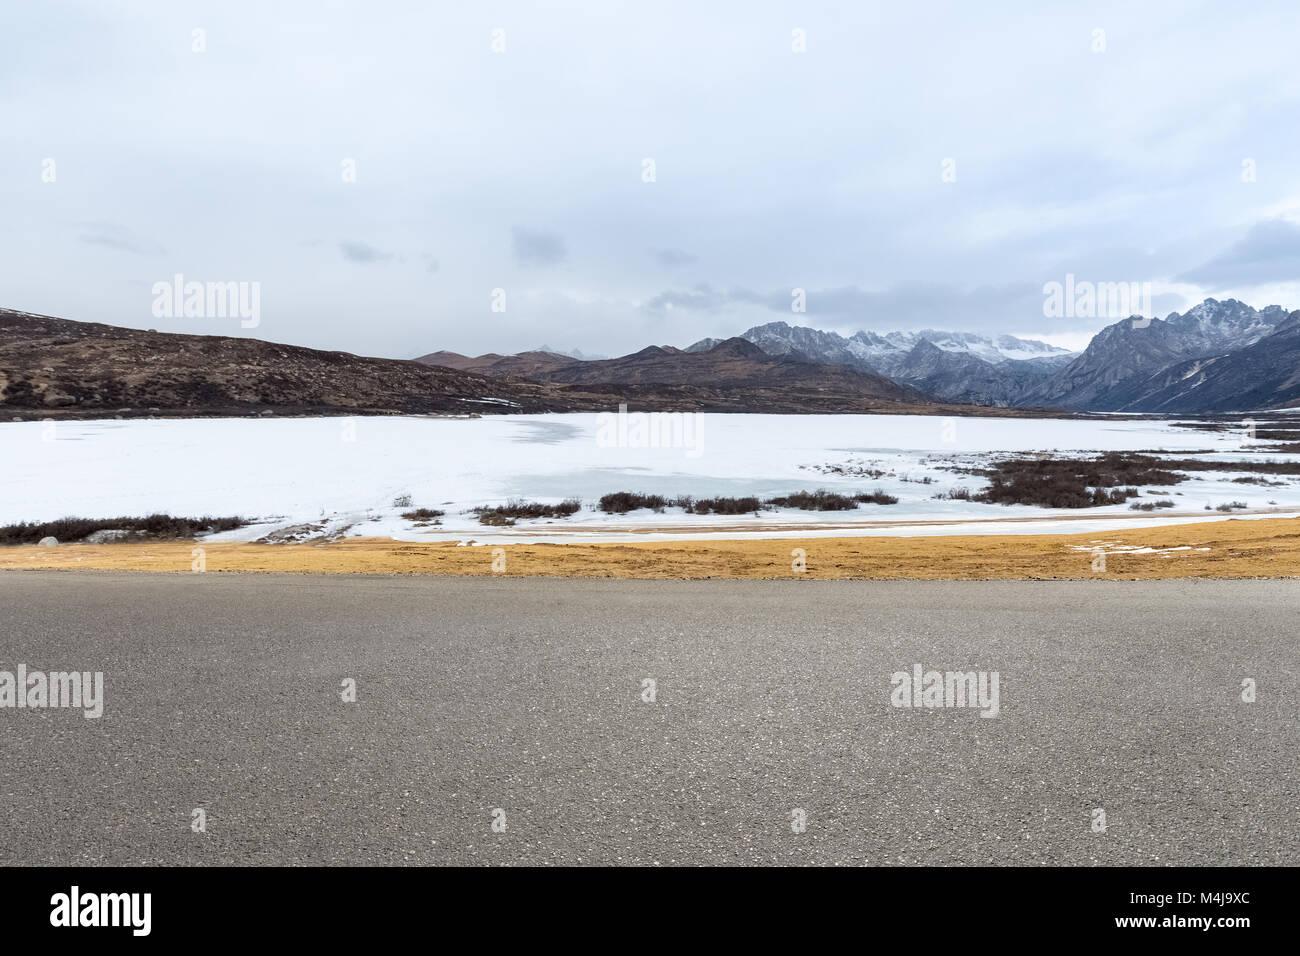 empty road in tibet plateau - Stock Image